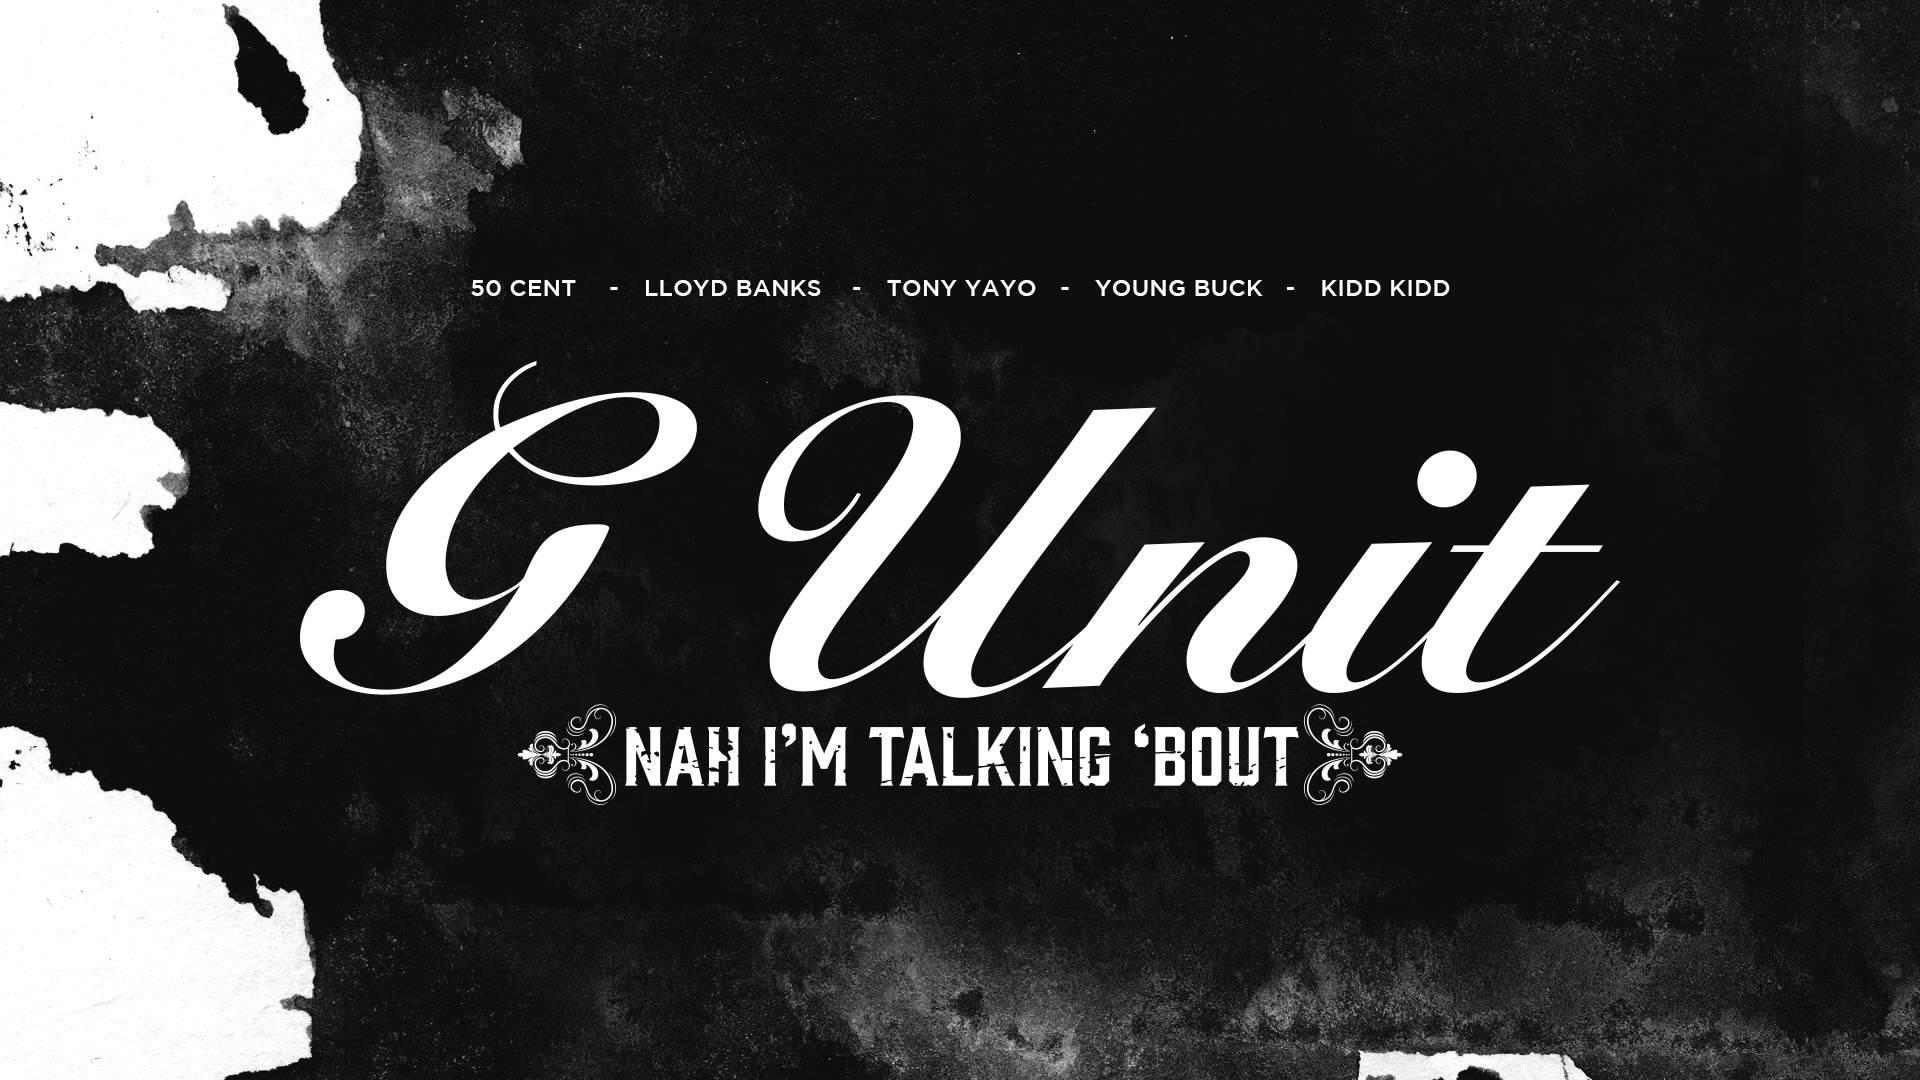 G Unit Nah I M Talking Bout Audio Vexradio Hit Boy Lloyd Banks 50 Cent Music